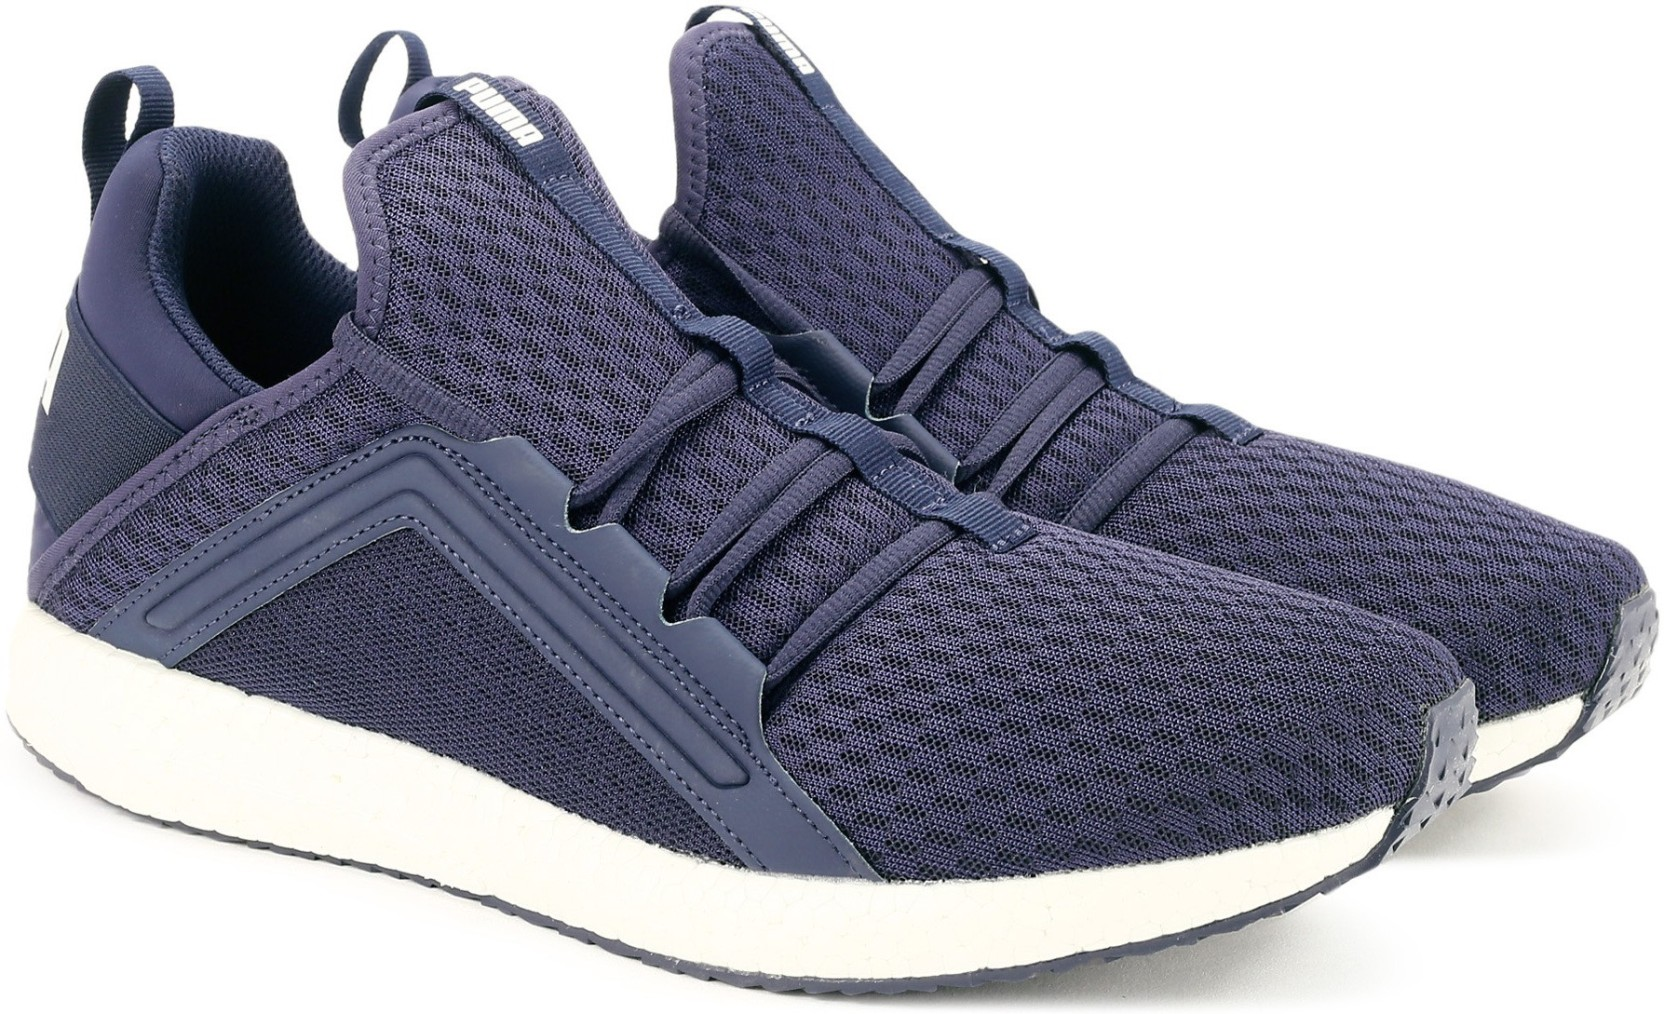 Puma Mega NRGY Running Shoes For Men - Buy Peacoat-Puma White Color ... ba37524ac